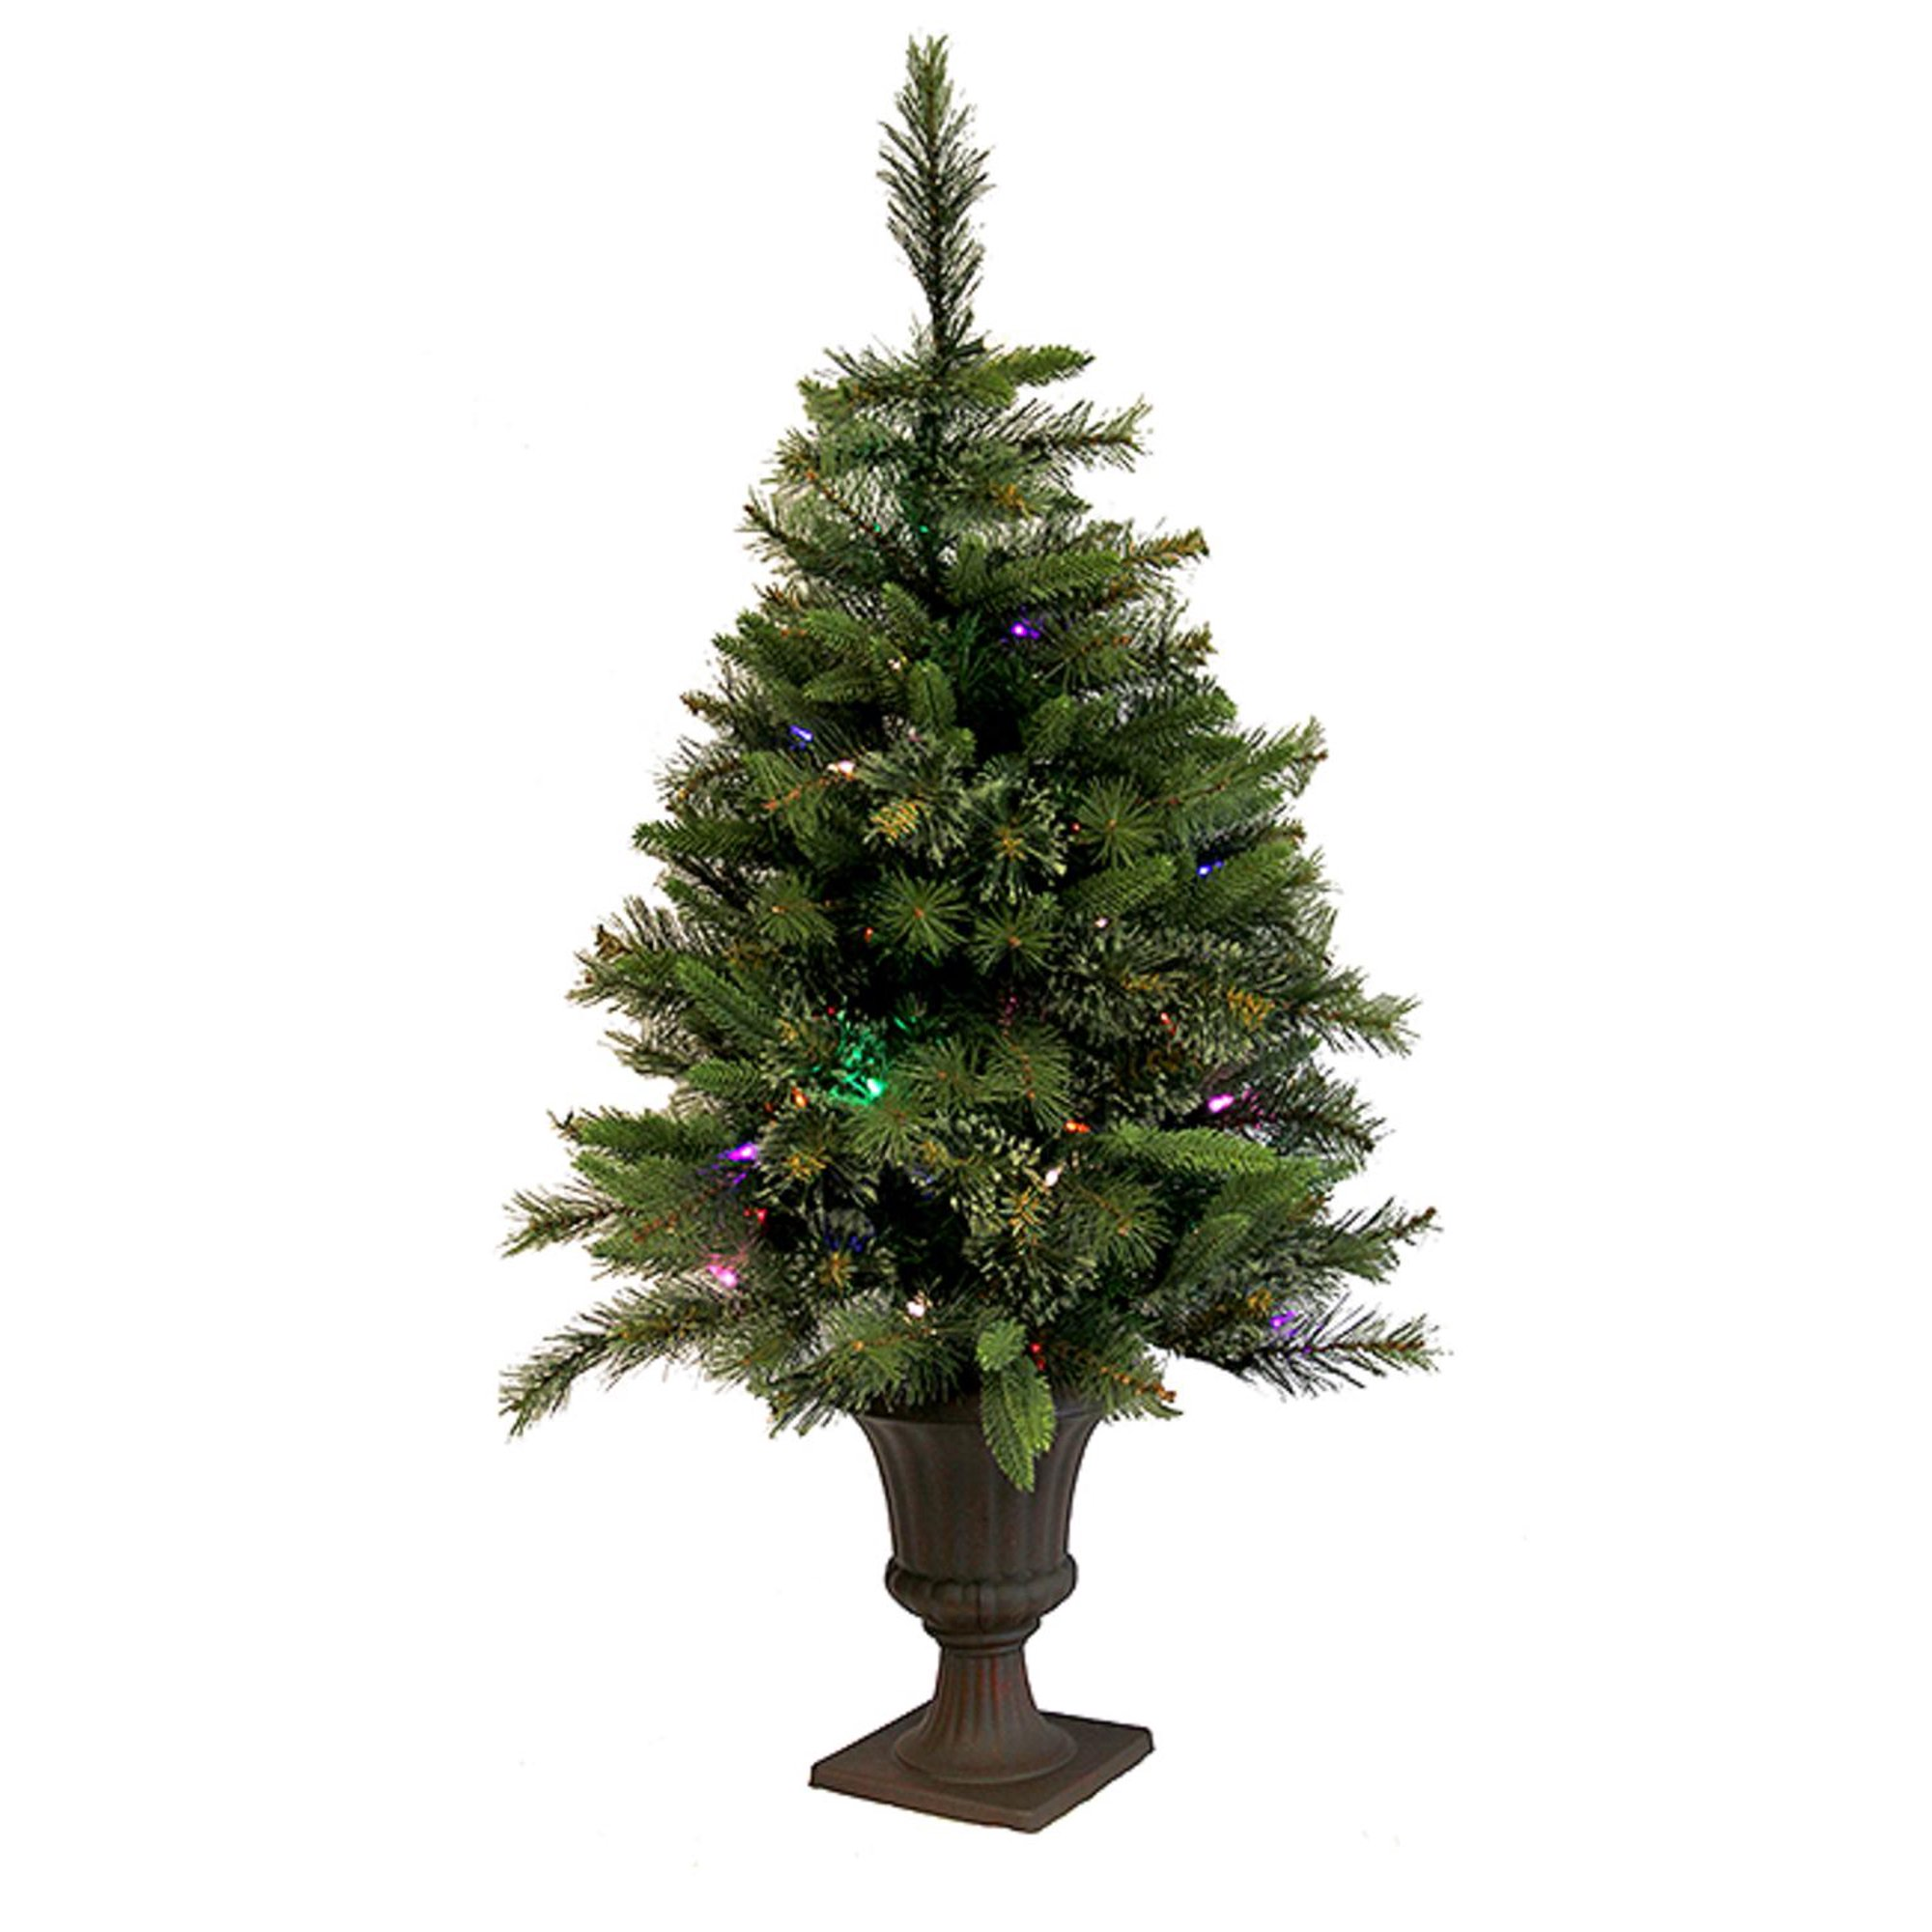 Pre Lit Outdoor Christmas Trees Battery Operated.3 5 Pre Lit Battery Operated Cashmere Potted Christmas Tree Multi Led Lights